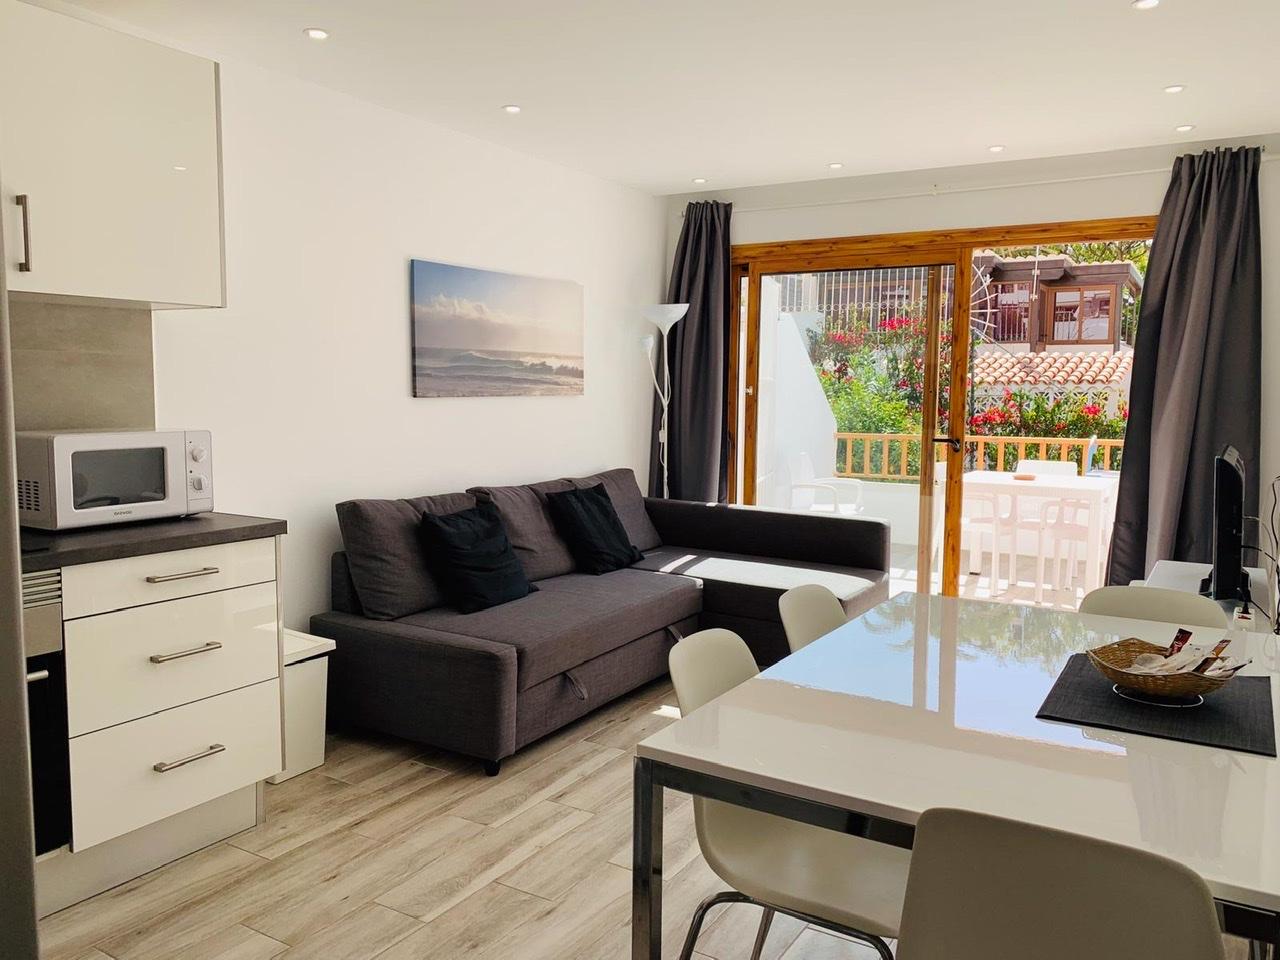 Letting Property Home LO710G, Tenerife, South Tenerife, San Eugenio